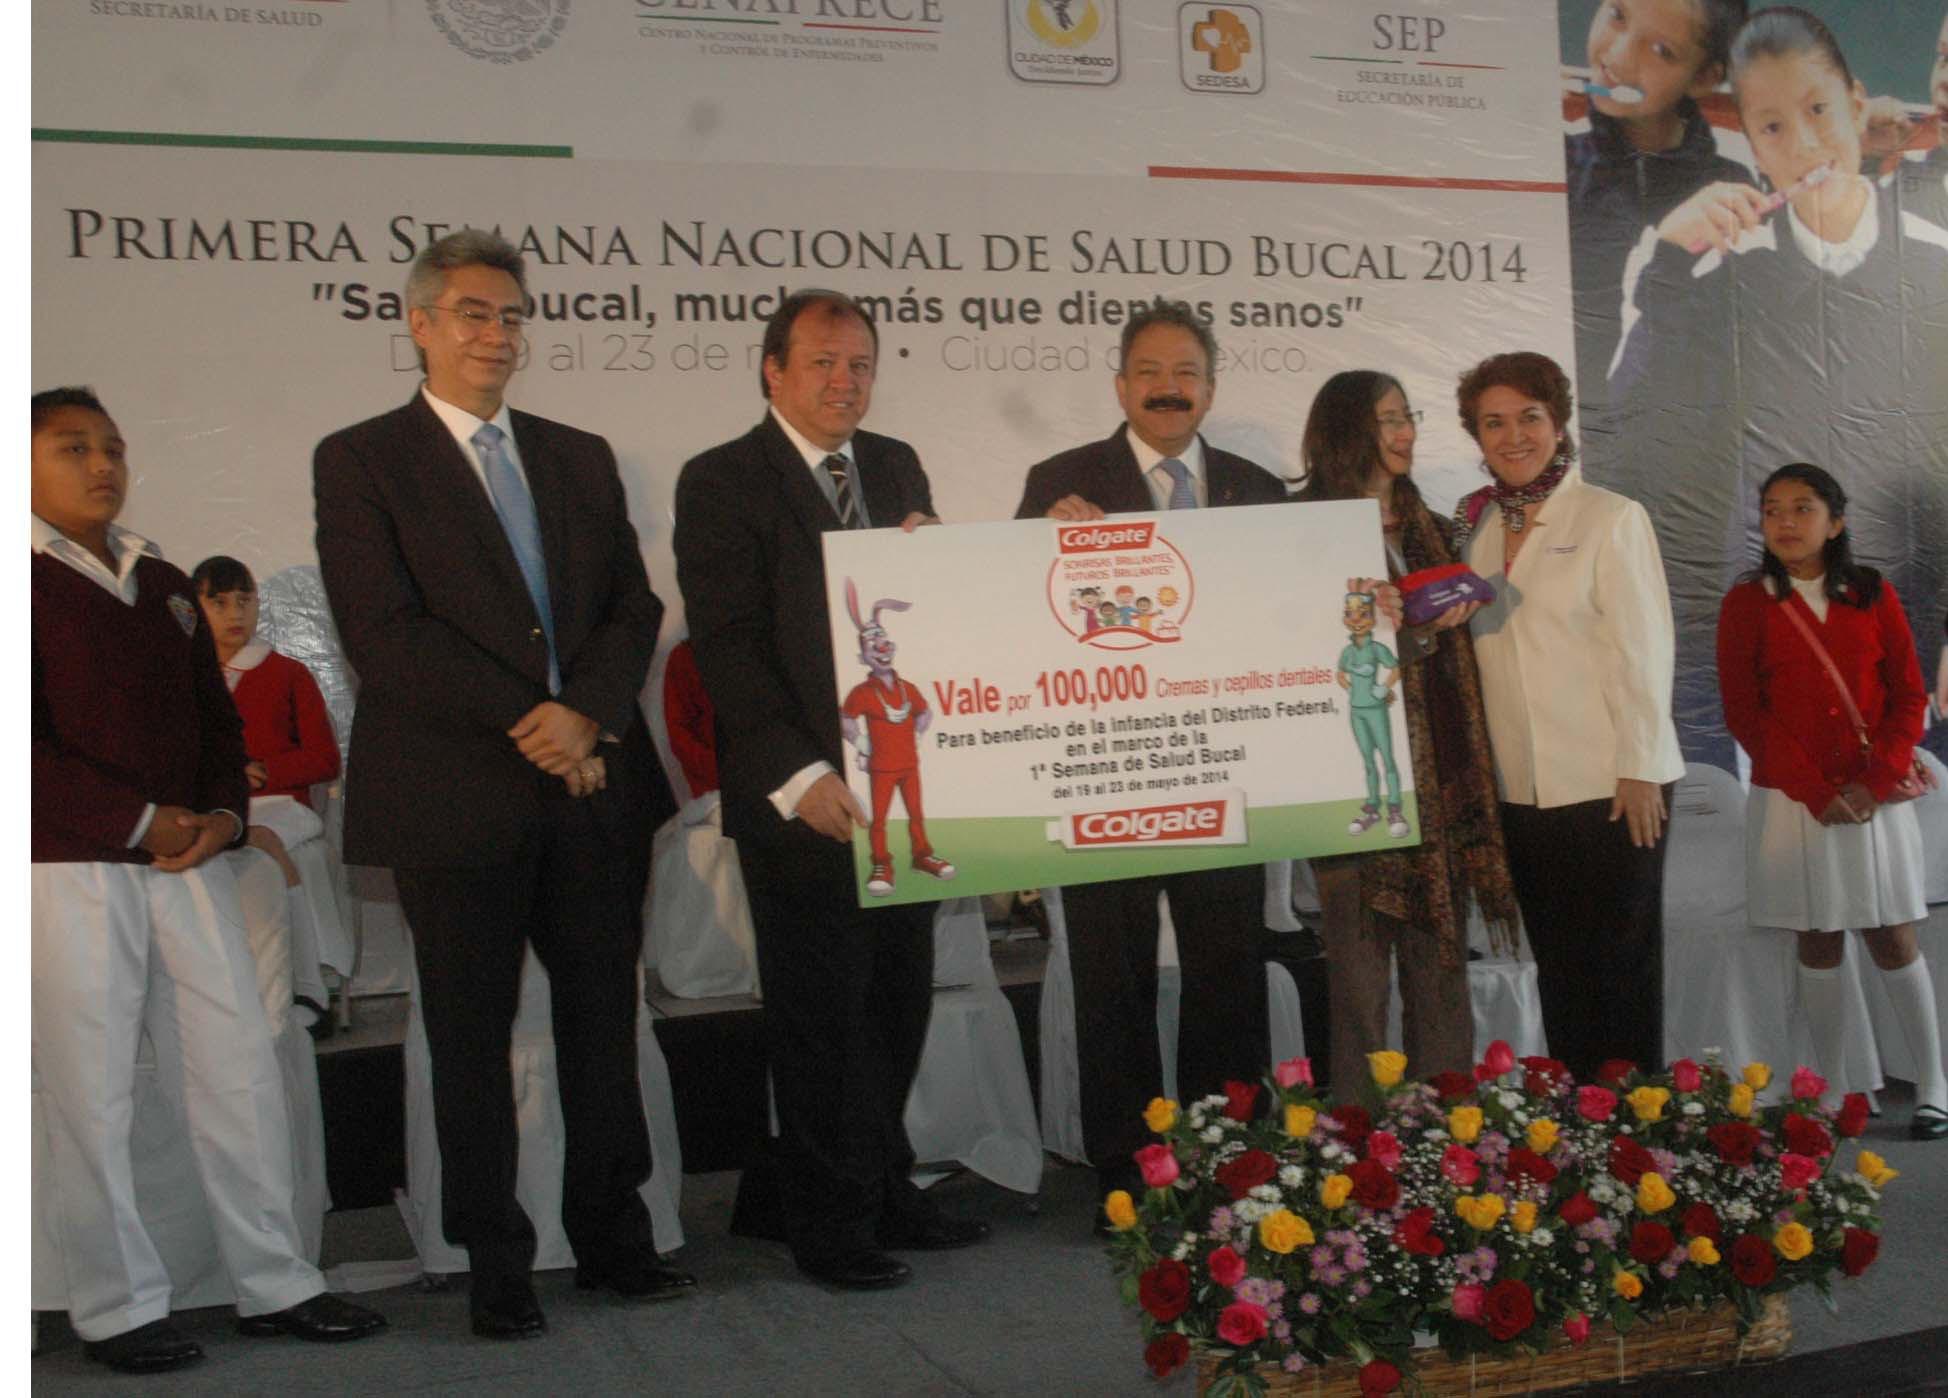 Primera Semana Nacional de Salud Bucal 2014